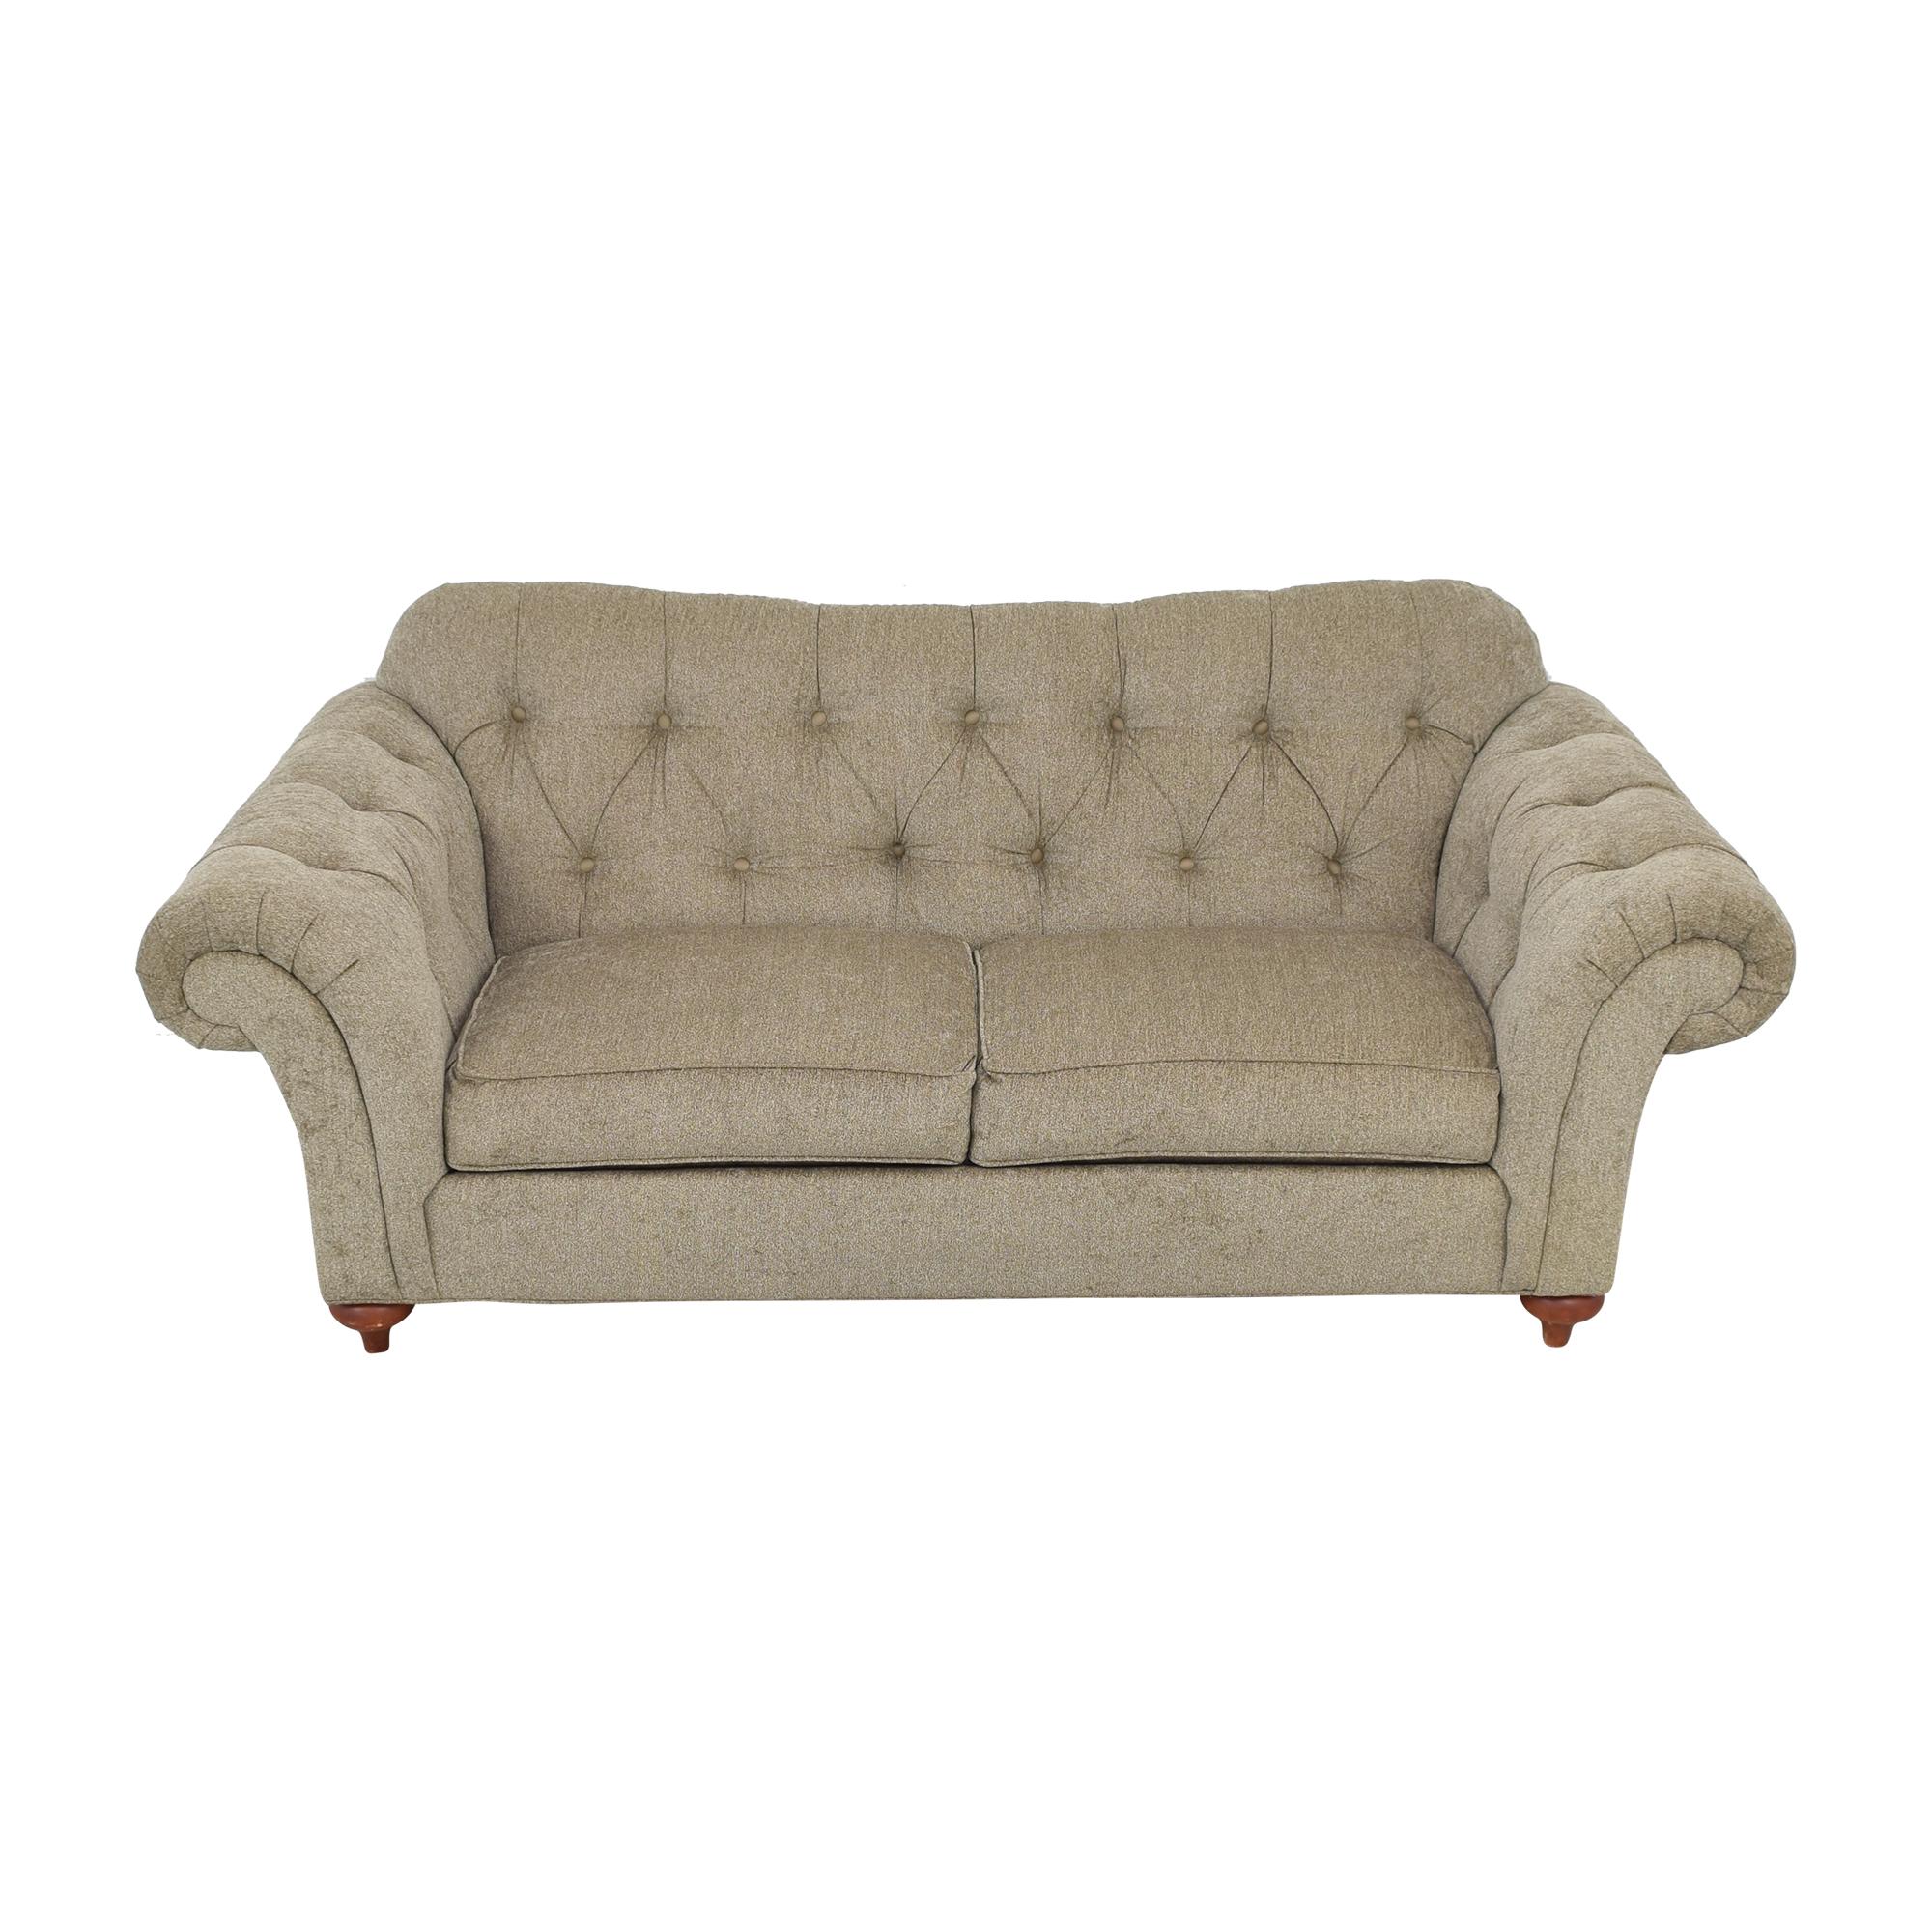 shop Ethan Allen Ethan Allen Two Cushion Sofa online